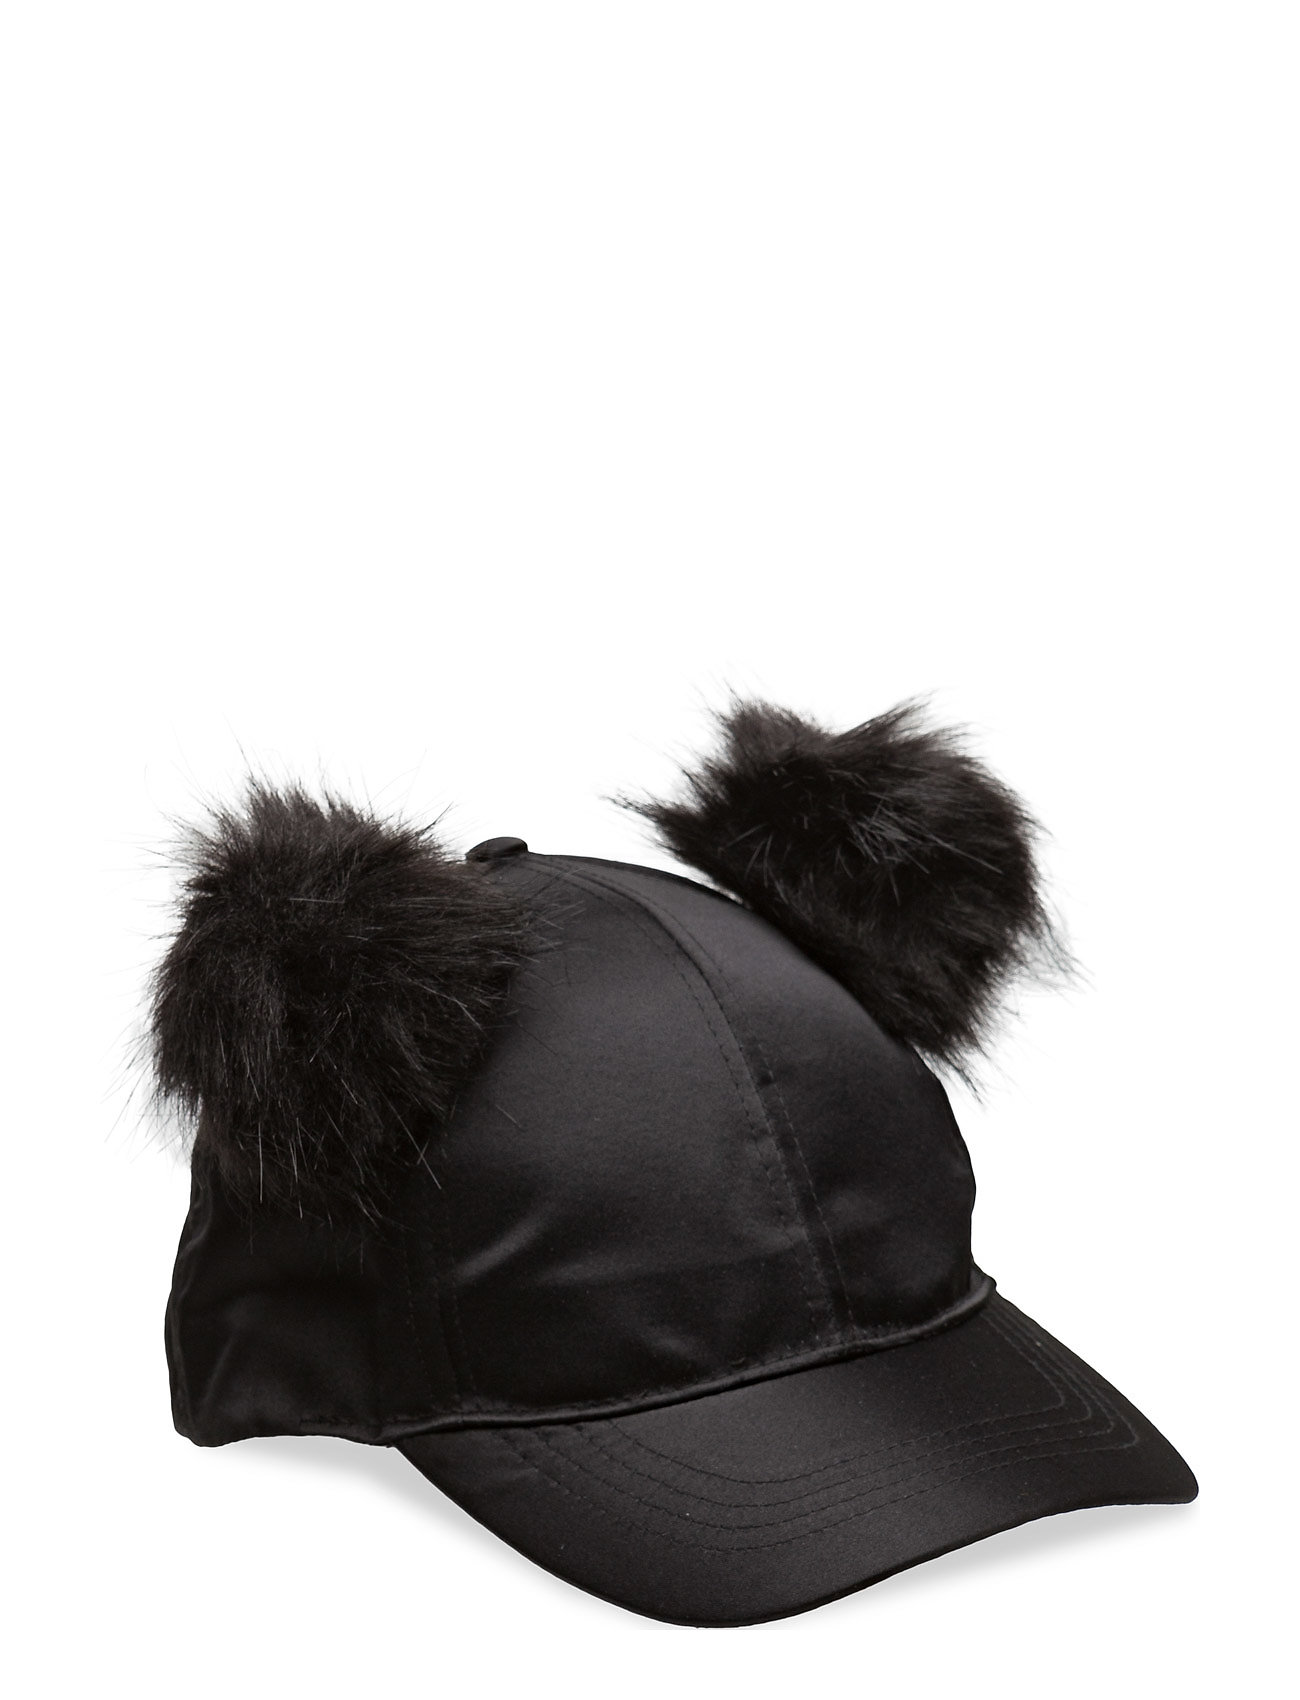 name it Nitkimbali fur cap f nmt på boozt.com dk